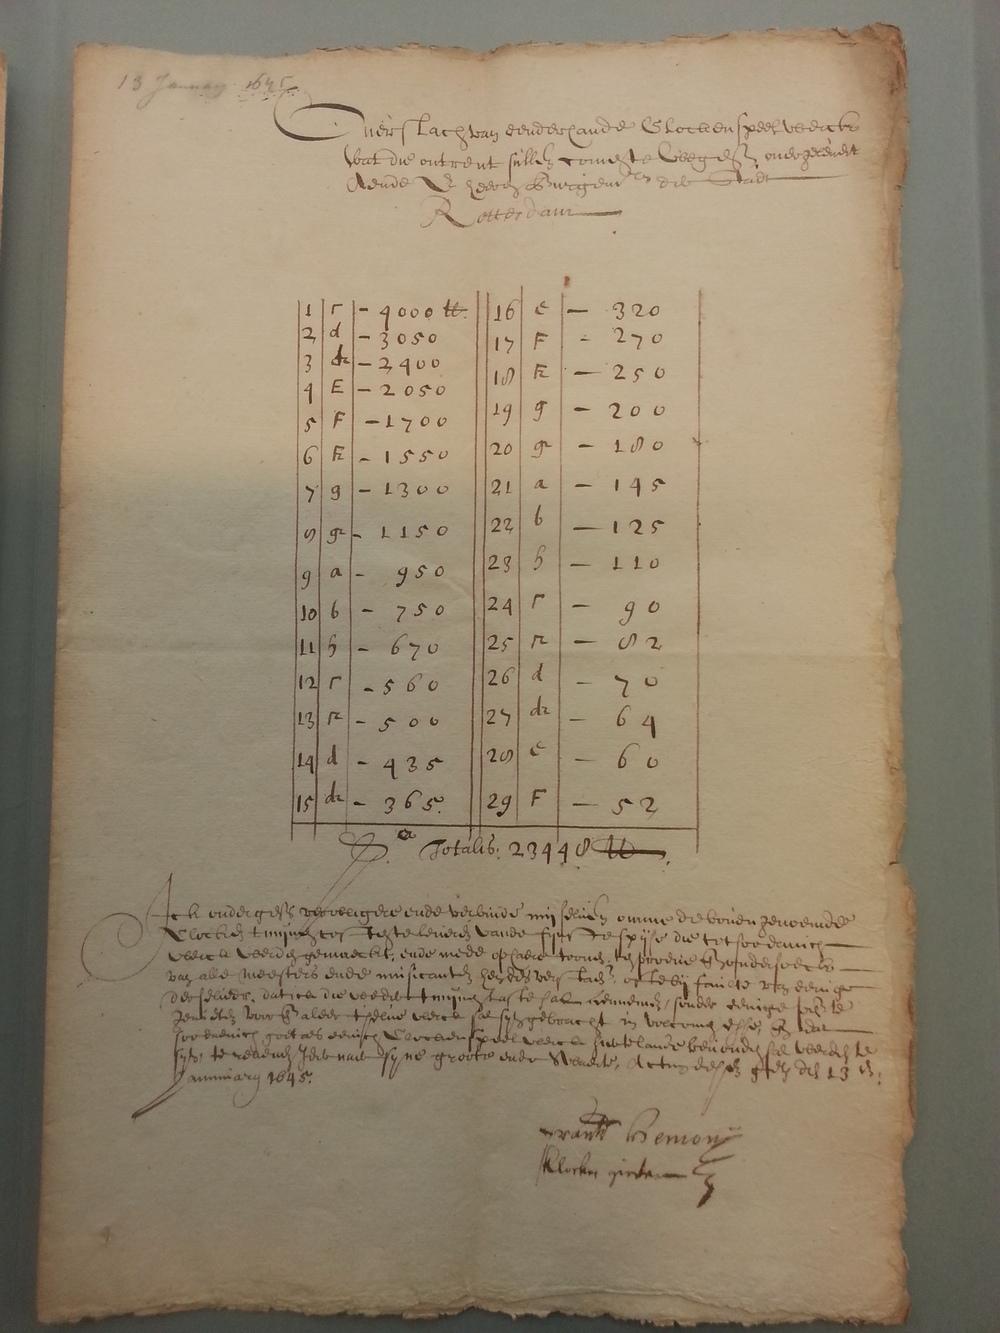 Originele offerte van Francois Hemony in 1645